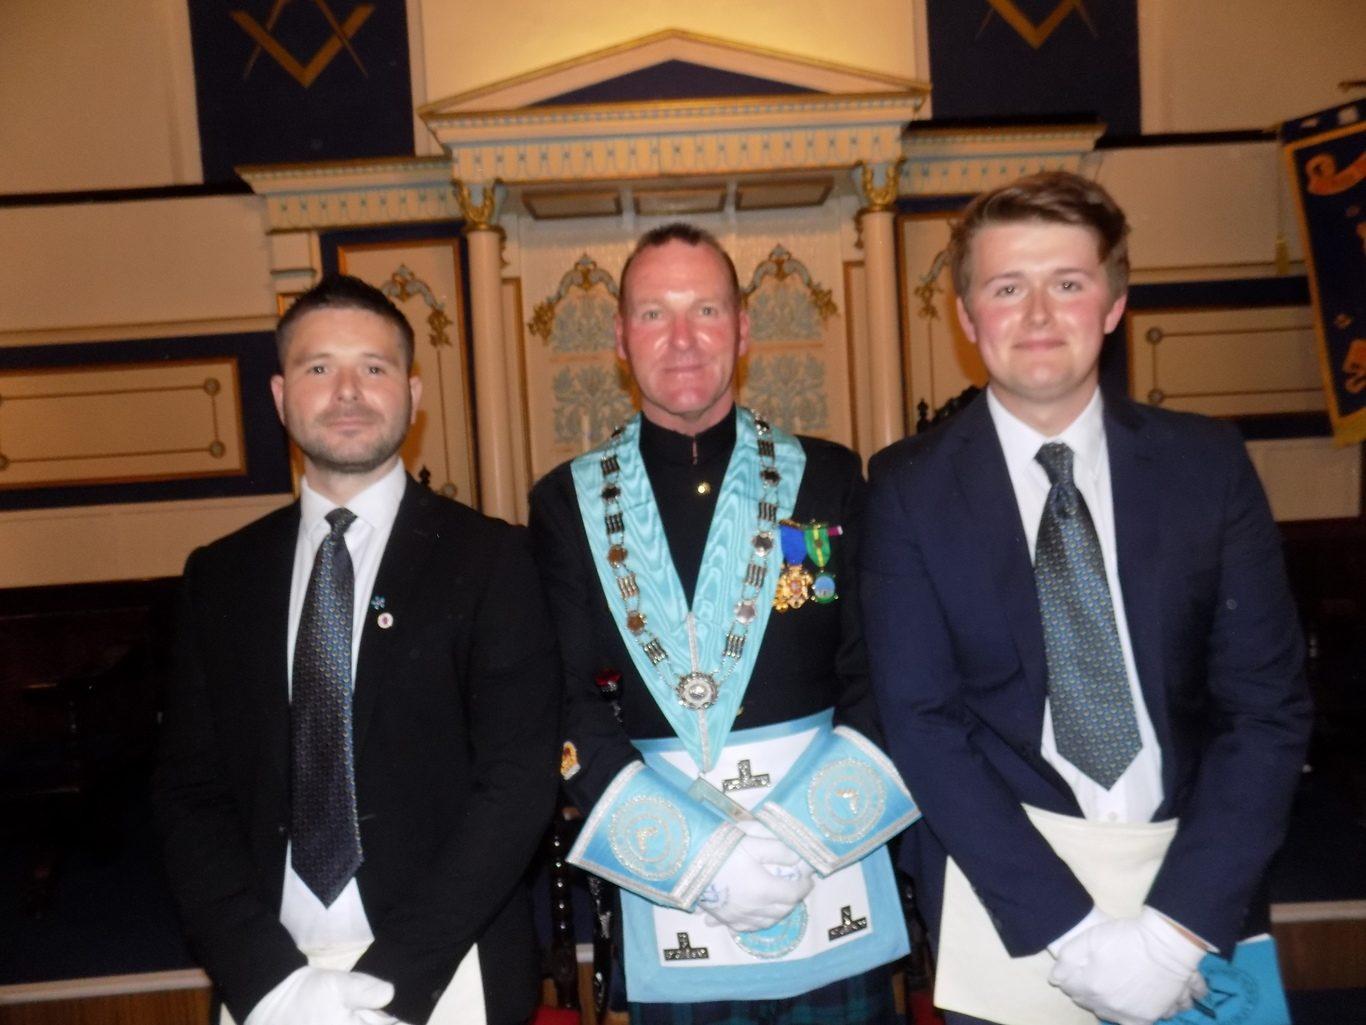 Wiltshire Freemasons - Freemasons